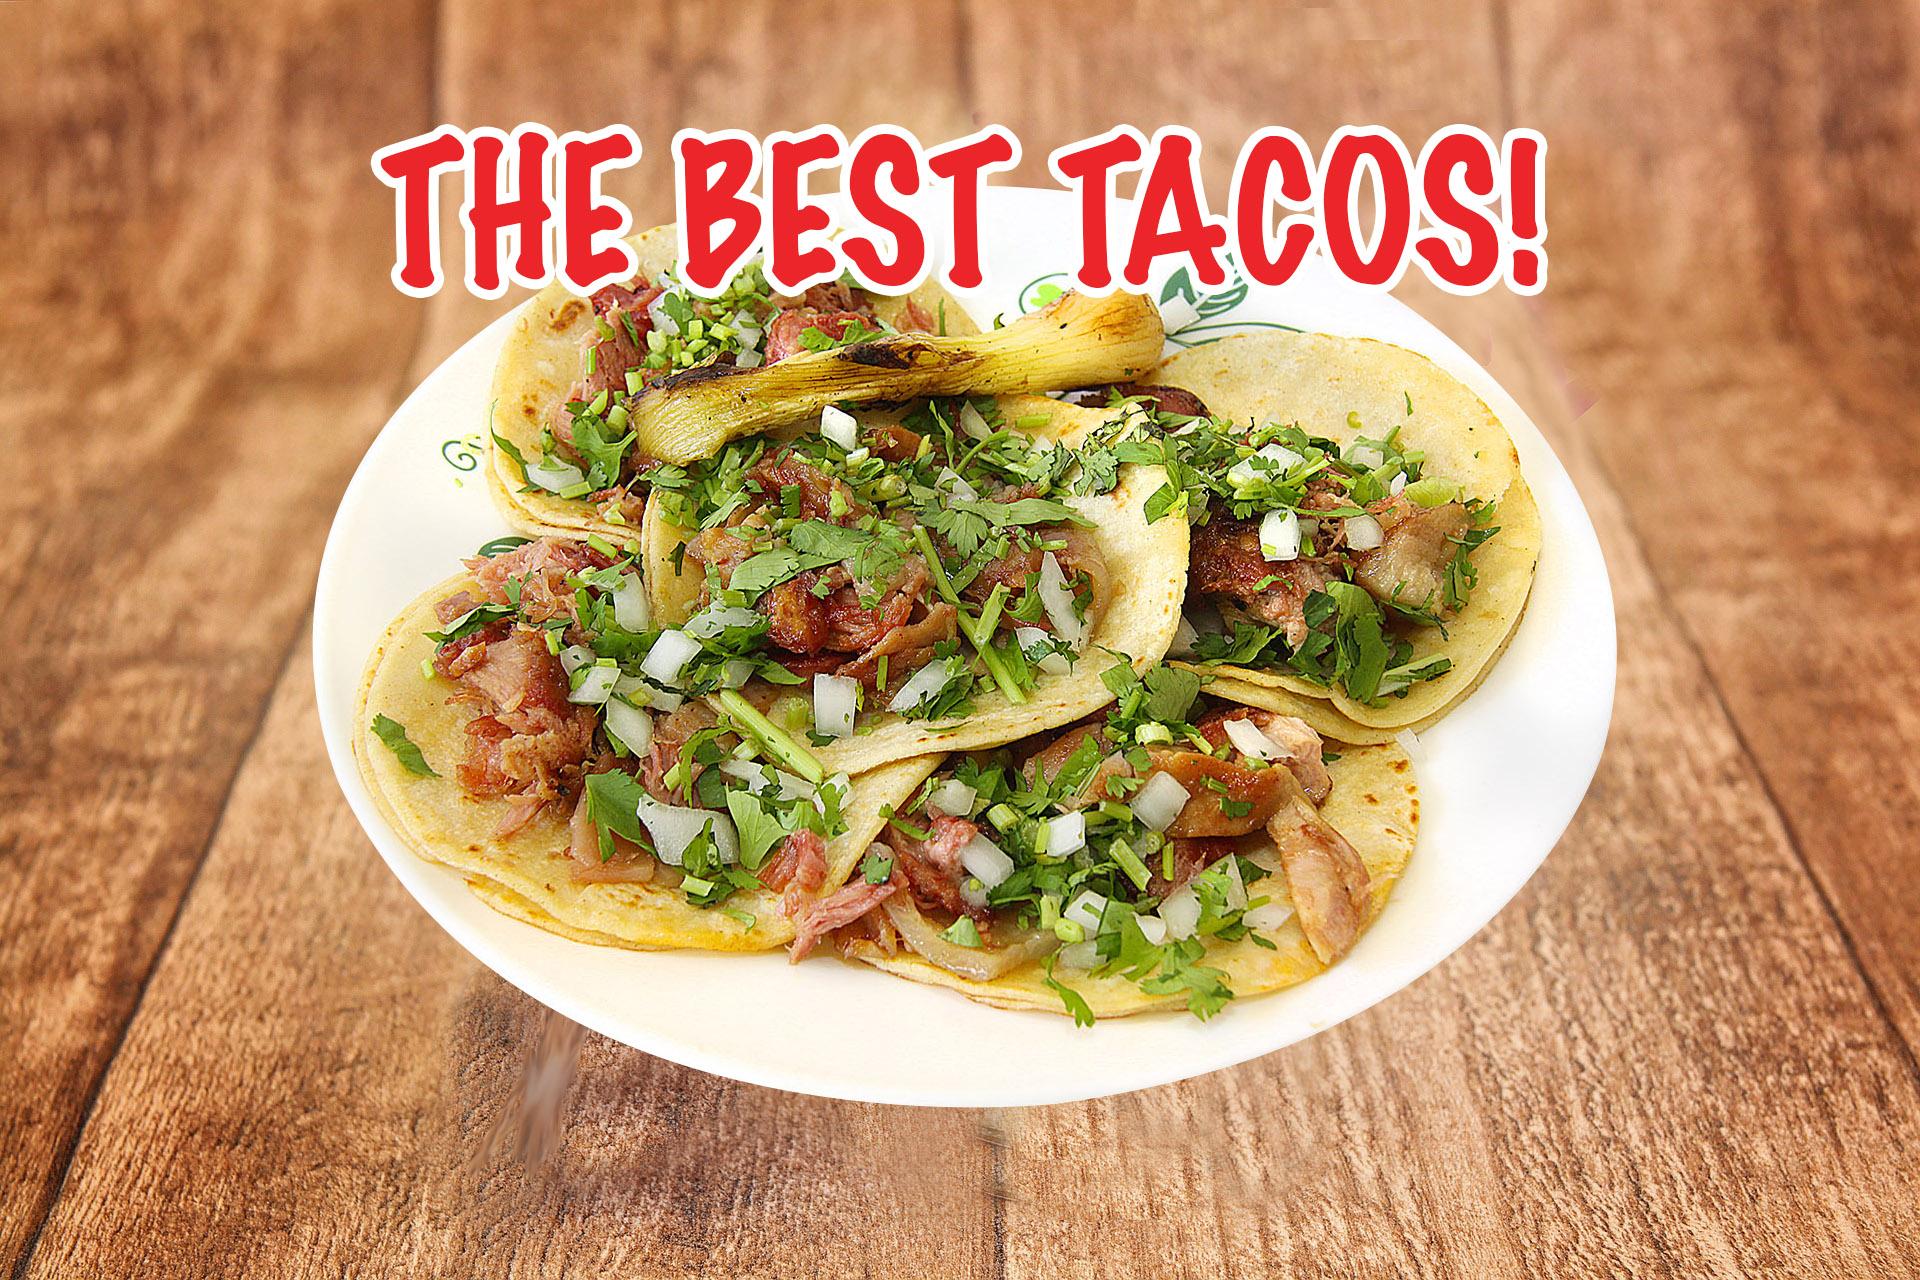 Tacos Taquitos Buena Ventura